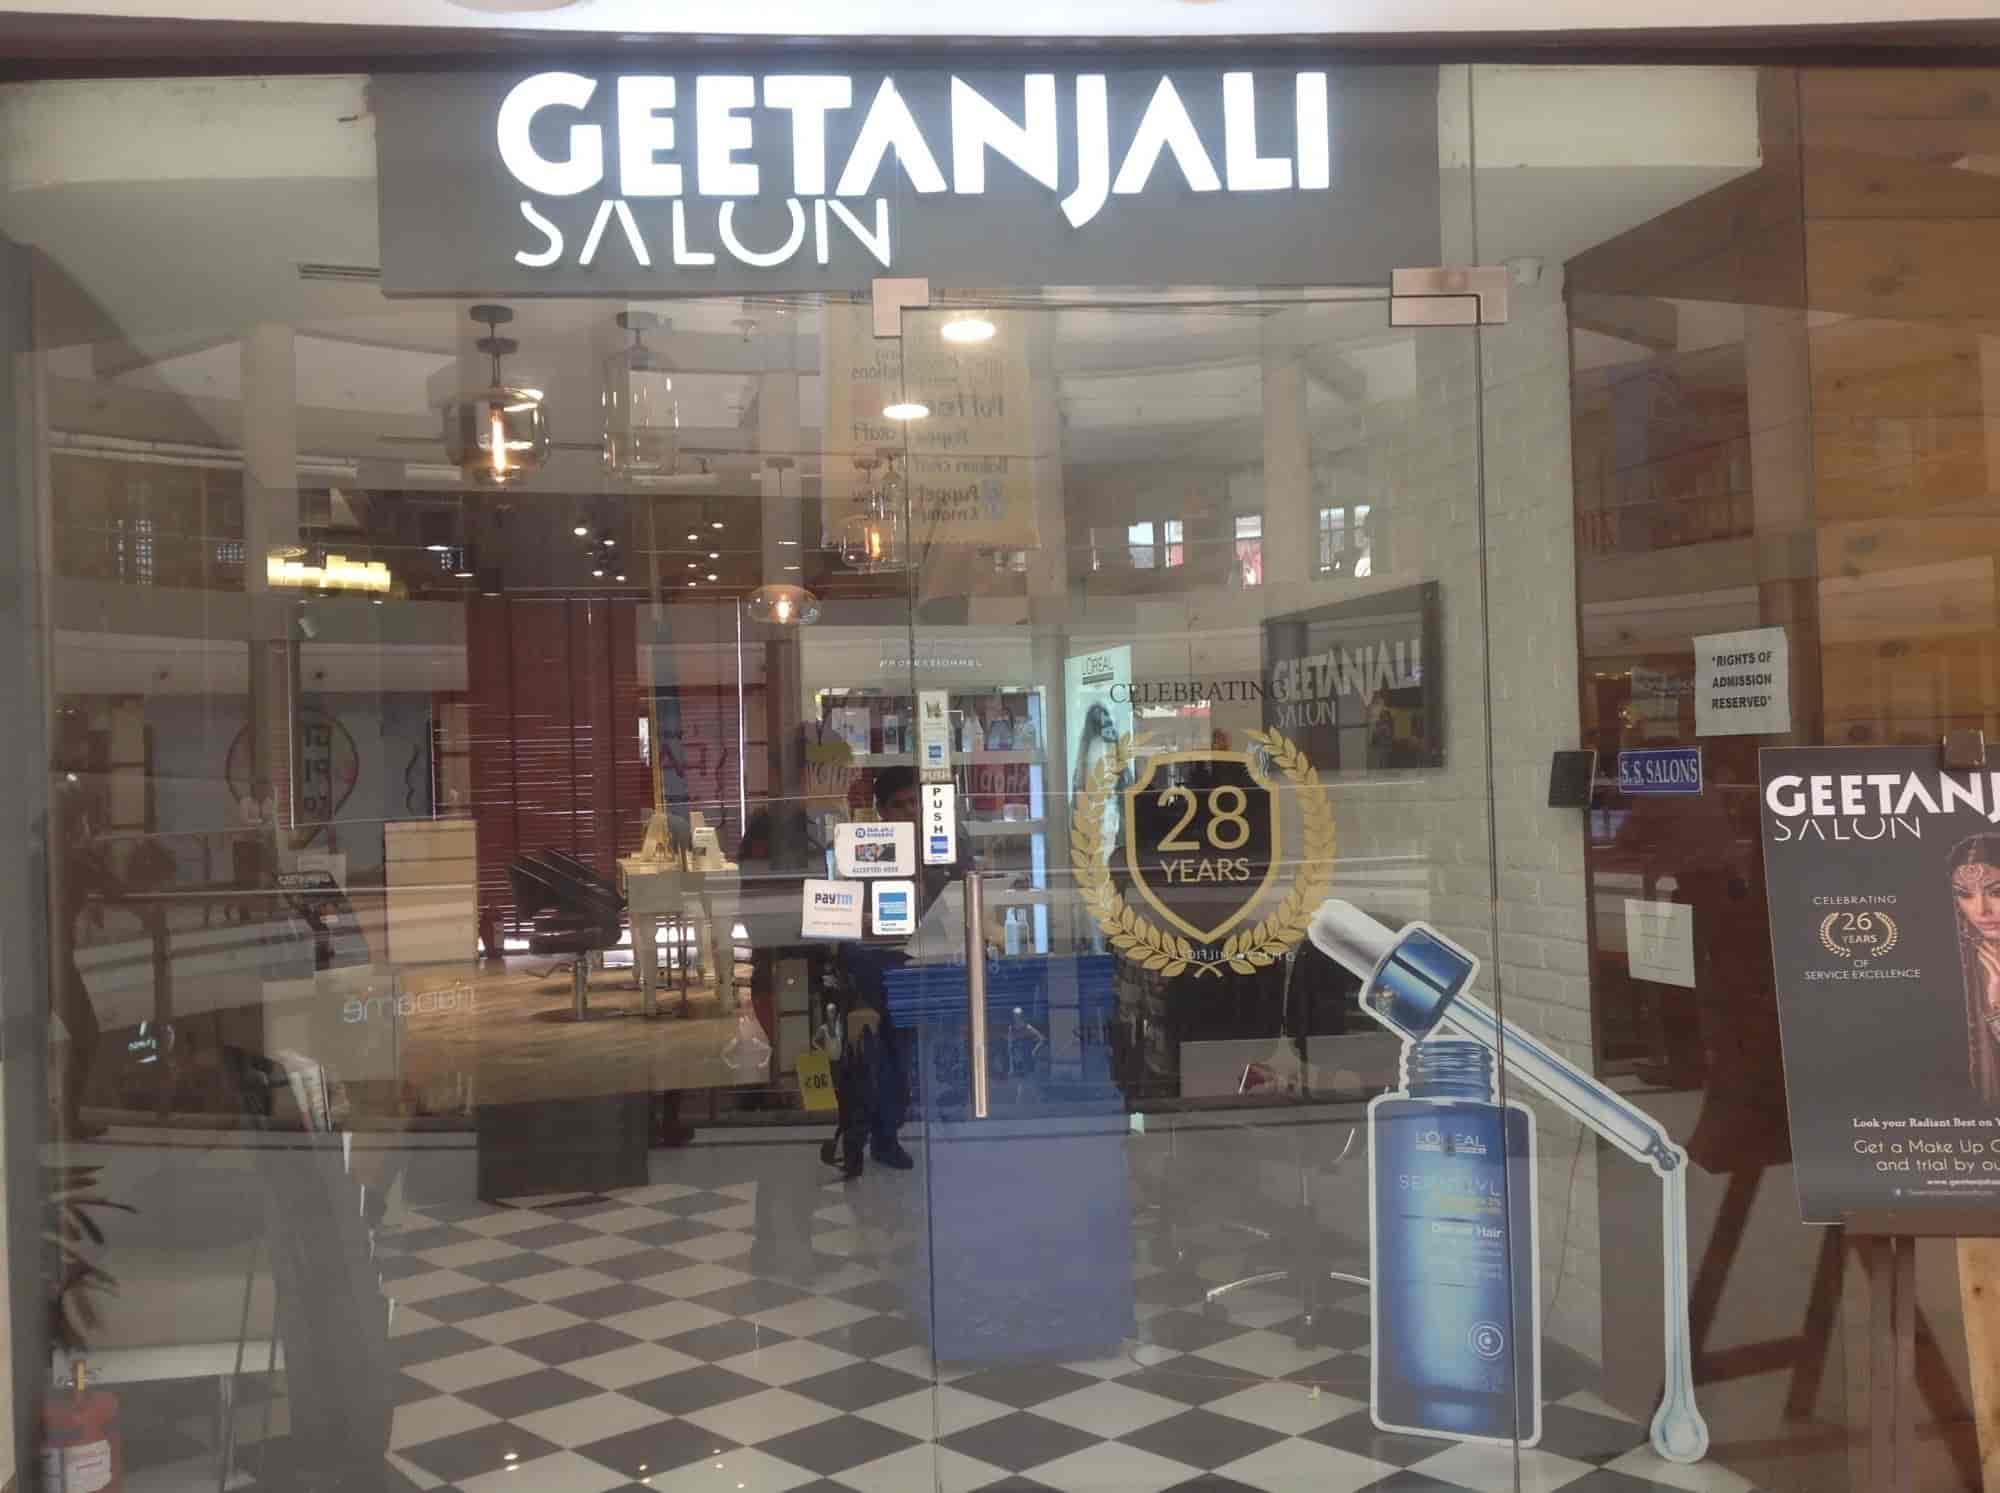 geetanjali salon photos, kamla nagar, delhi- pictures & images